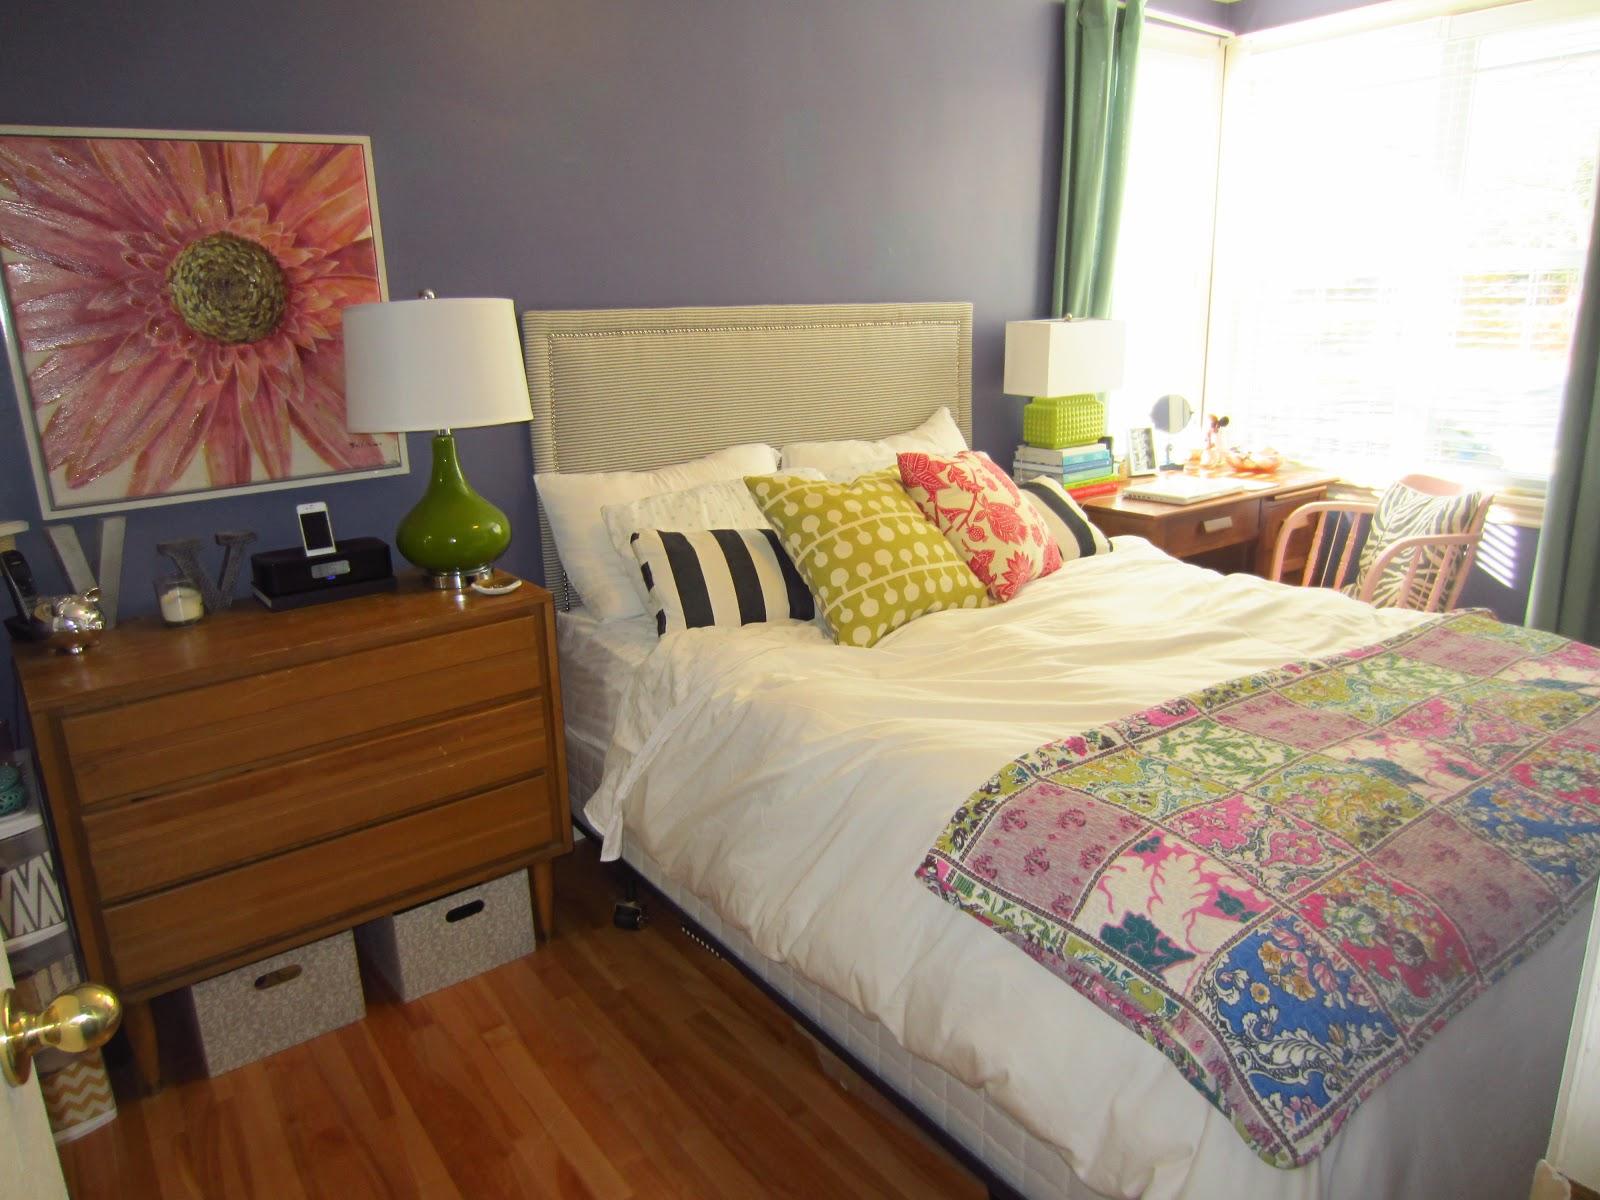 Homesense Beds: November 2012